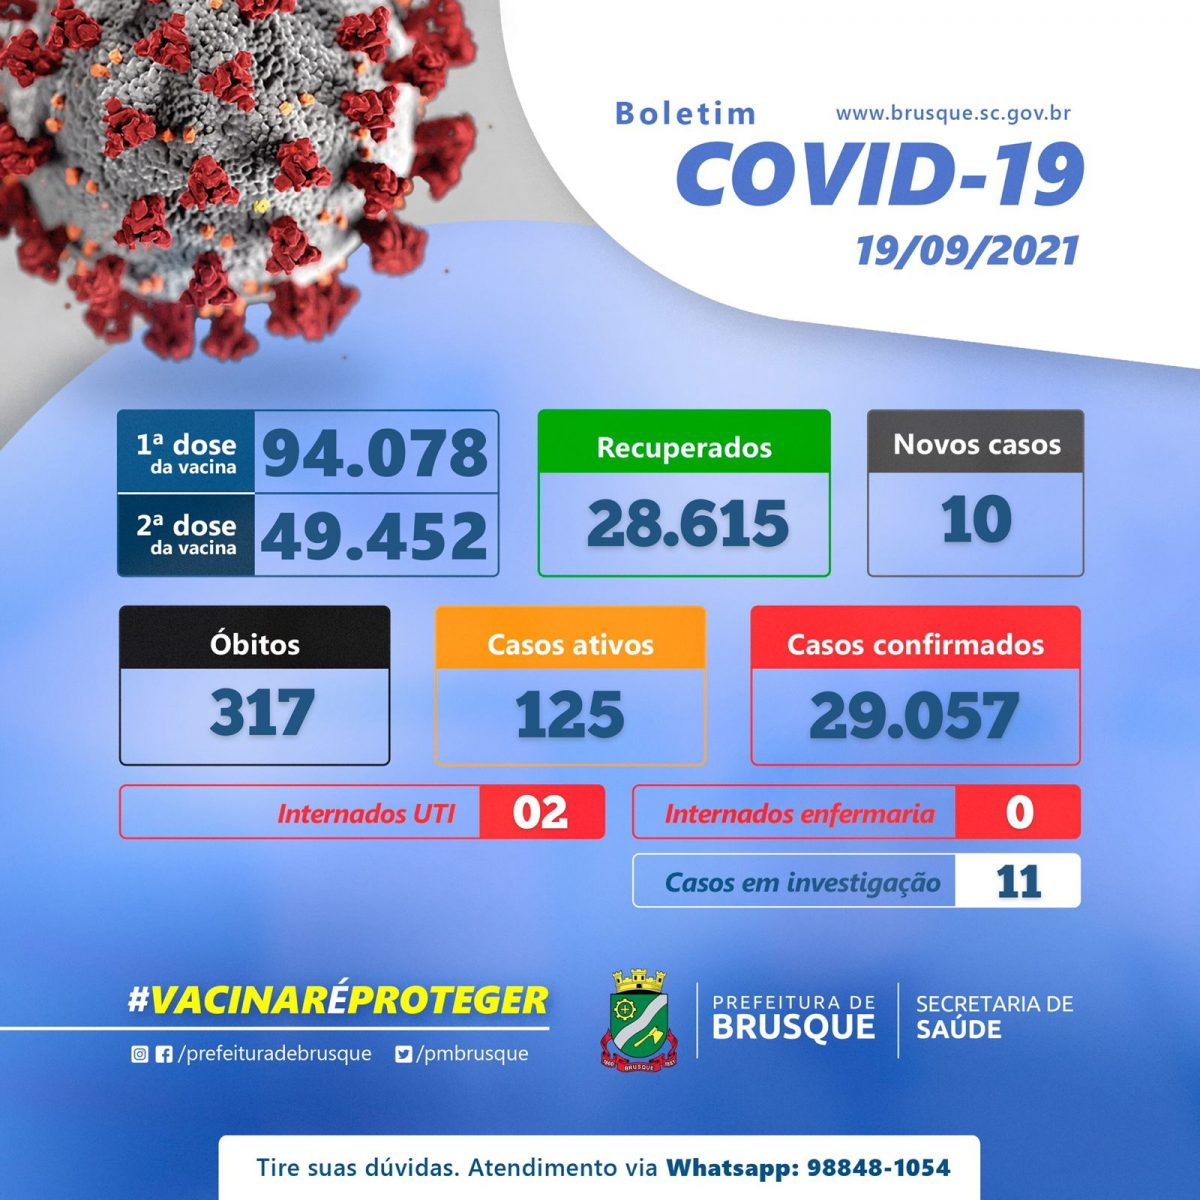 Covid-19: Brusque possui 125 casos ativos de Covid-19